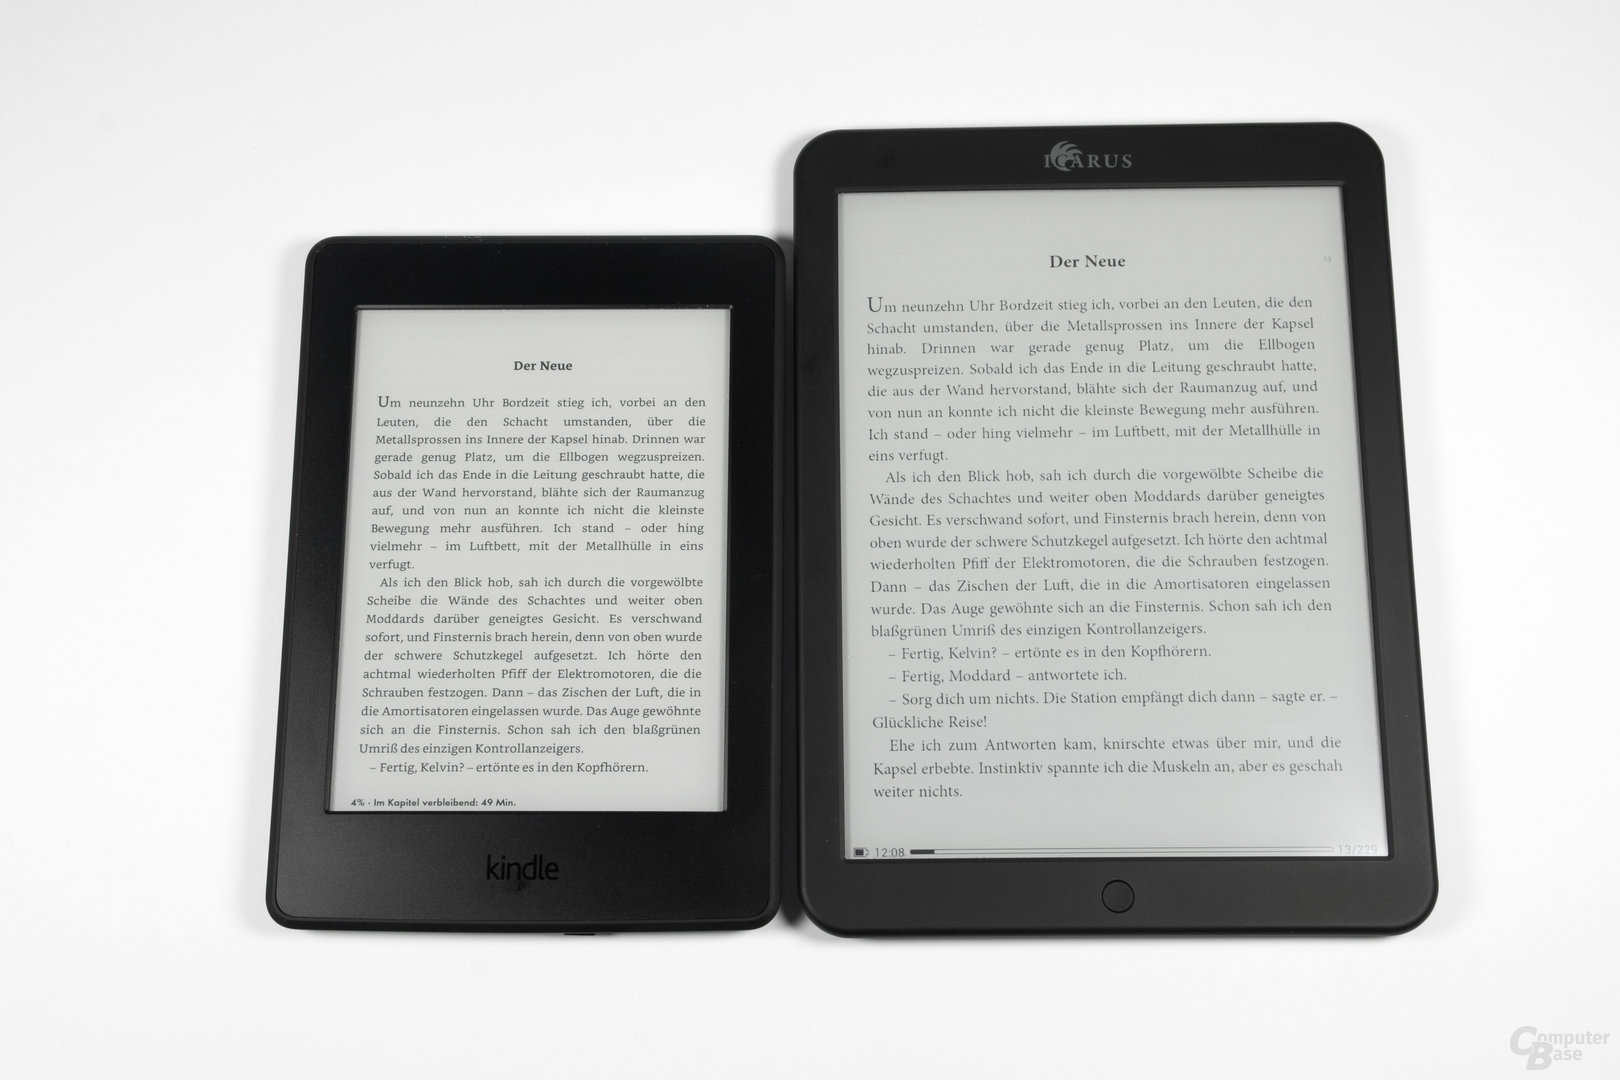 Schriftbildvergleich Kindle Paperwhite 2014 vs. Icarus Illumina XL (Adobe Reader)